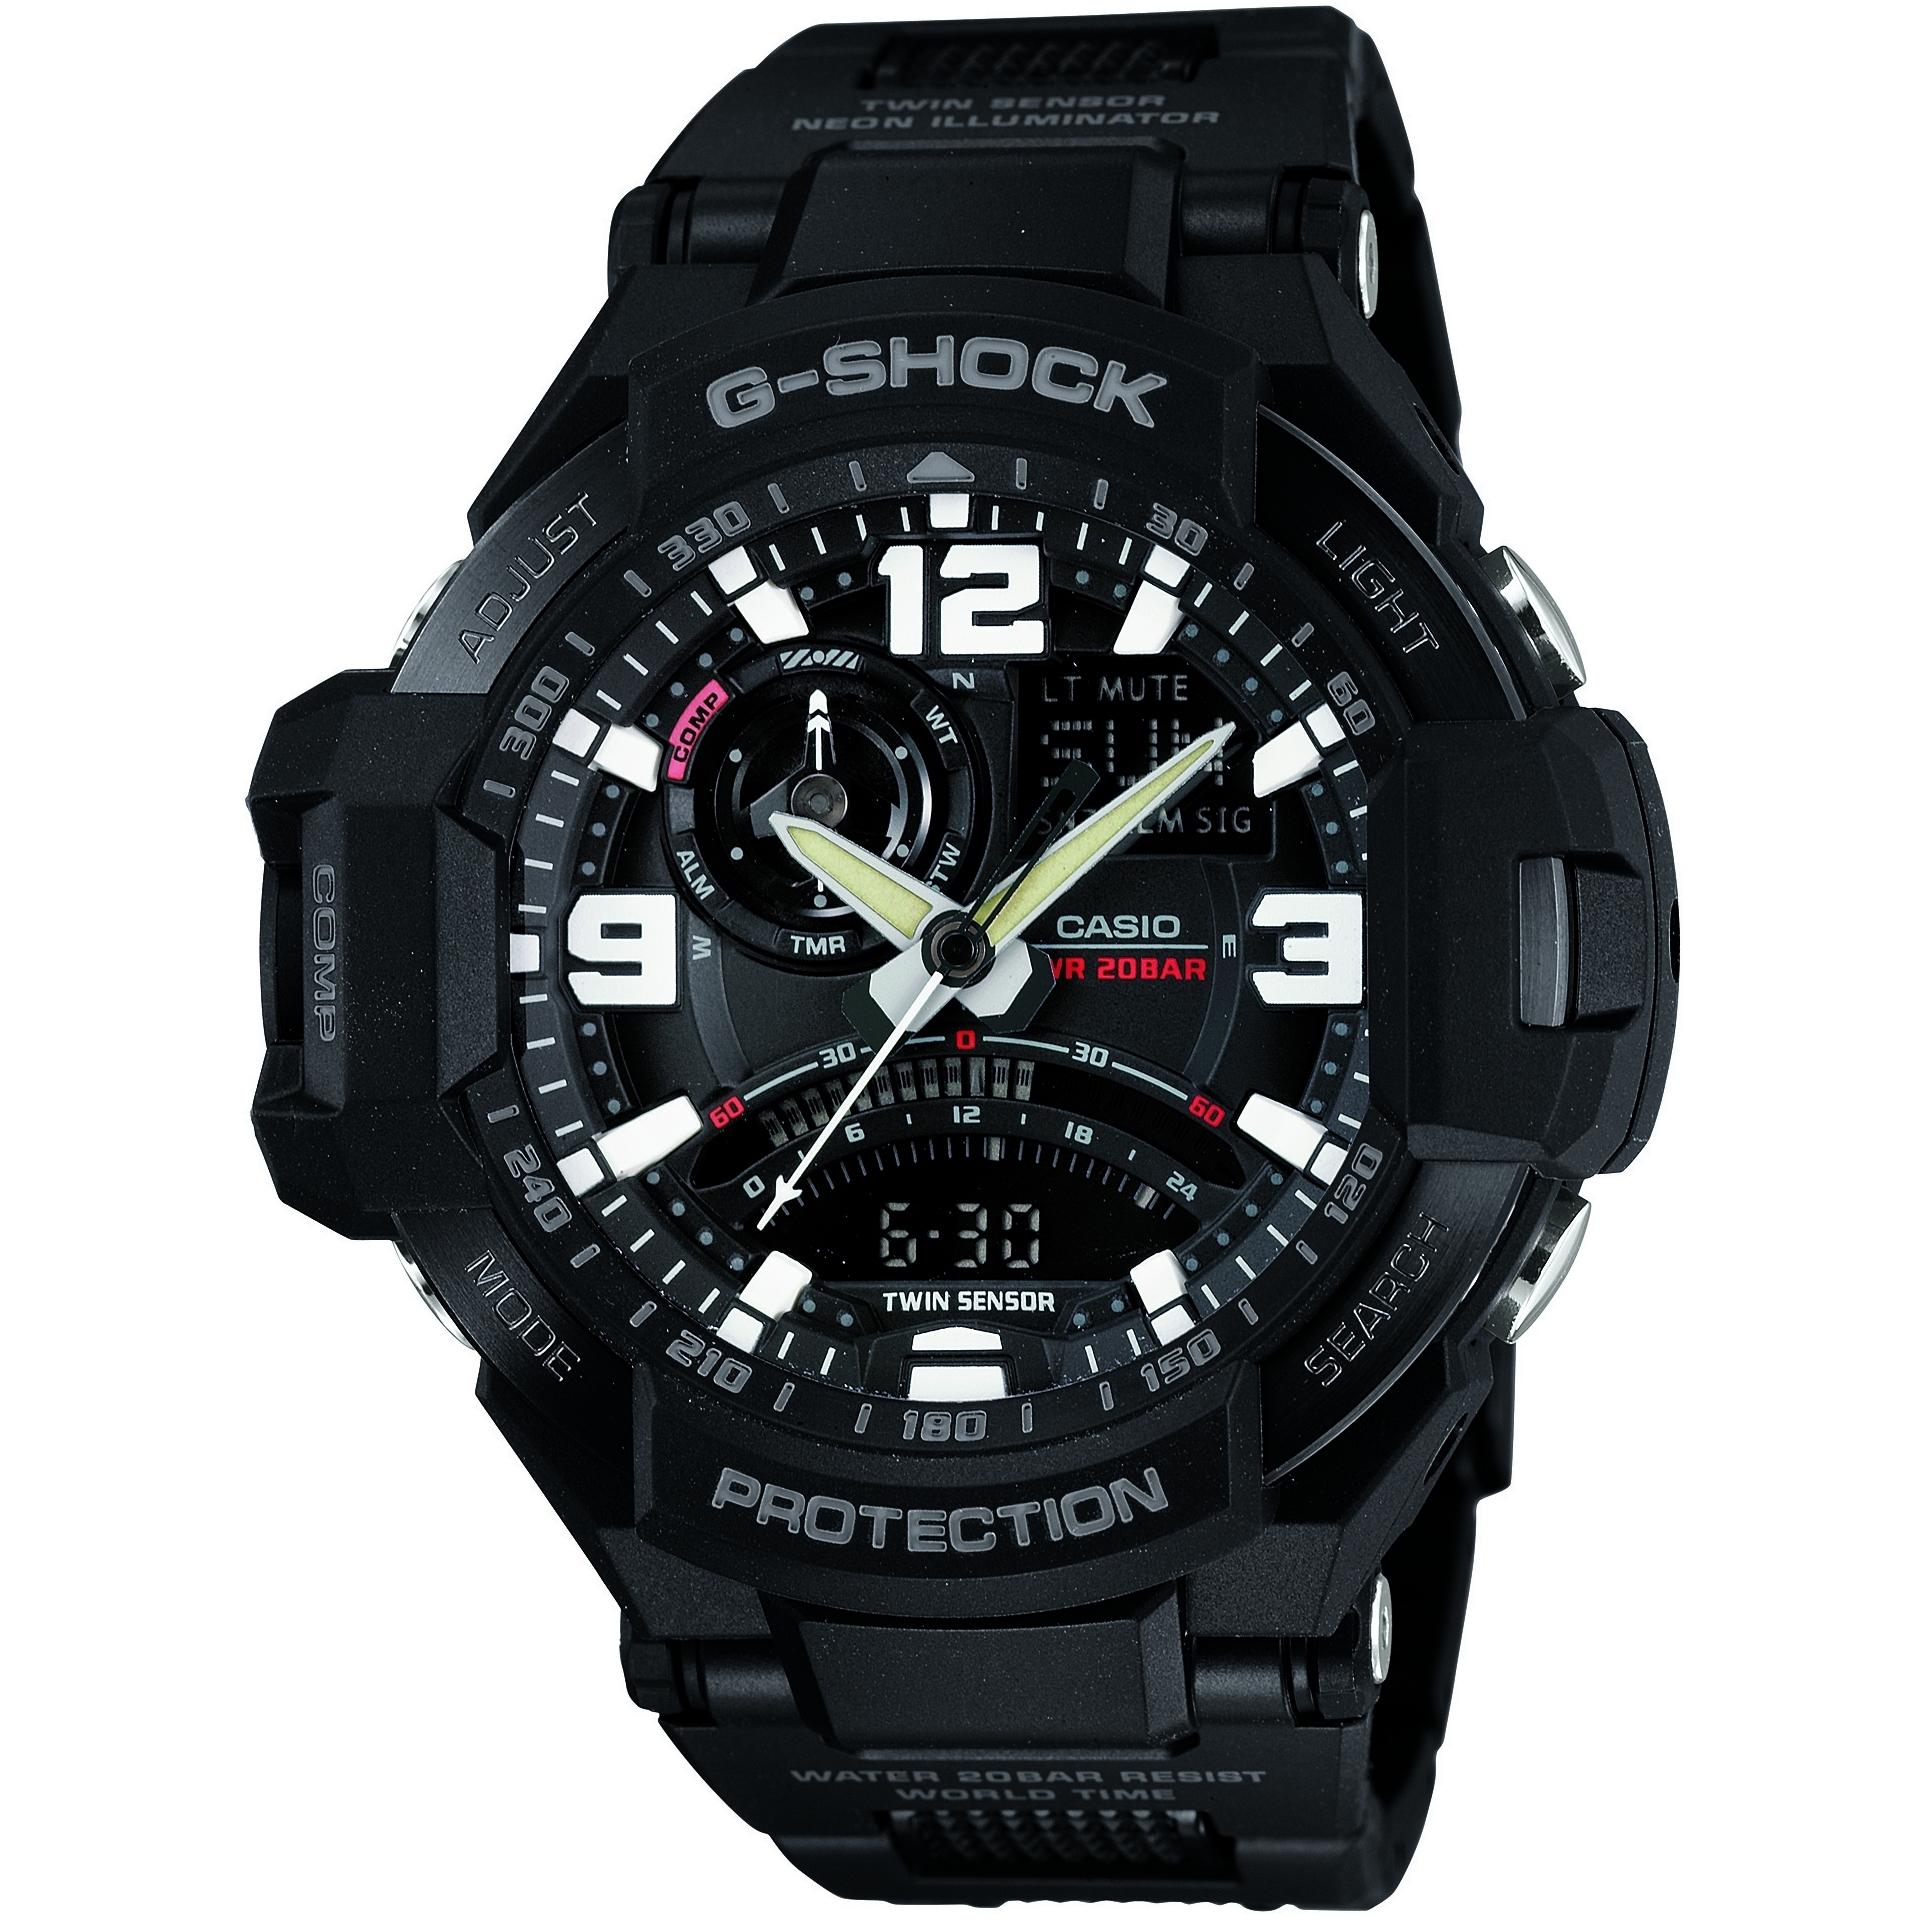 b646b399950d Gents Casio G-Shock Premium Sky Cockpit Alarm Chronograph Watch  (GA-1000FC-1AER)